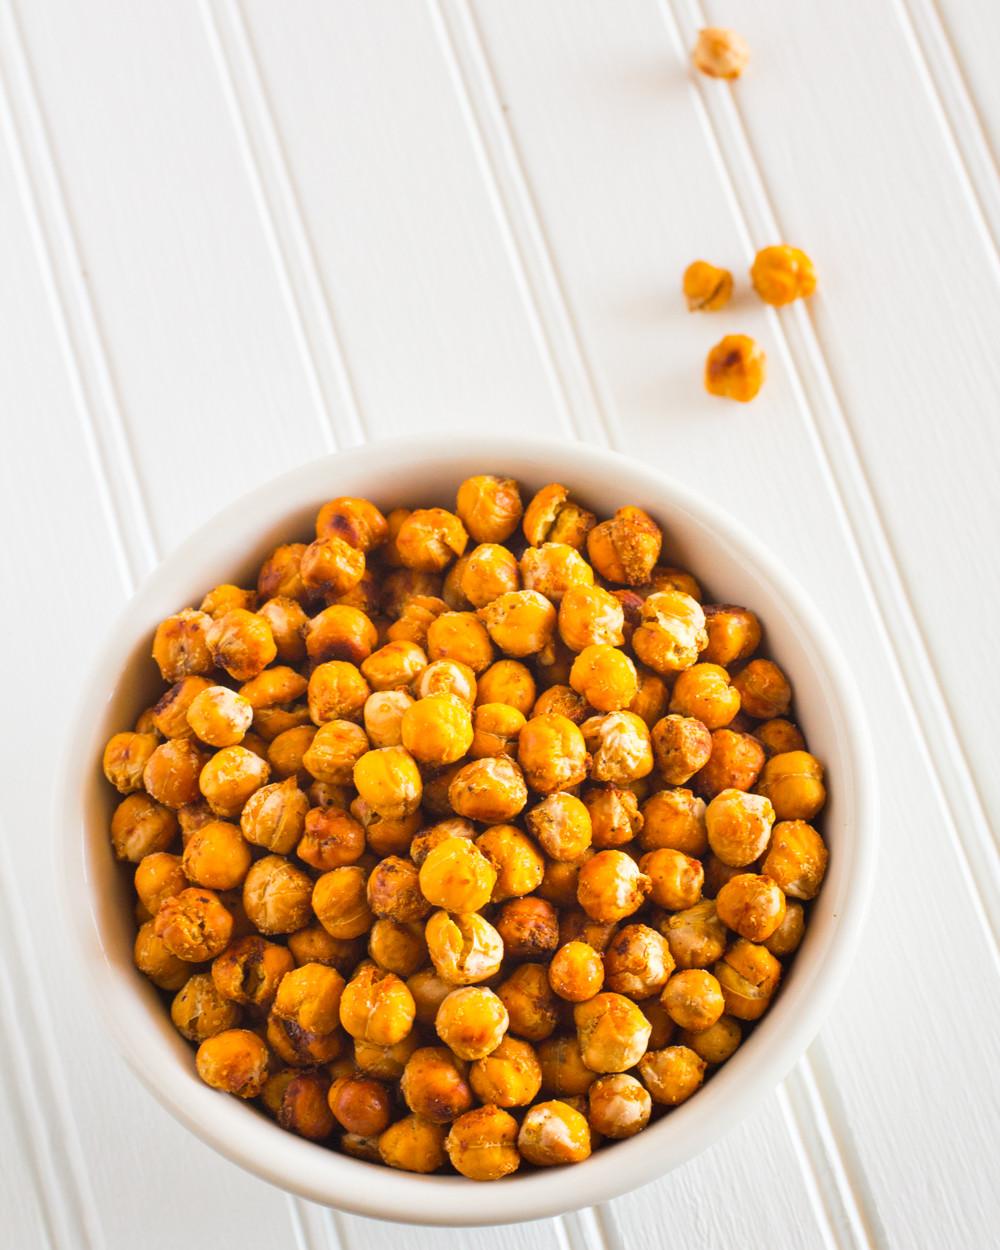 Chickpea Snacks Recipes  Crispy Roasted Chickpeas Snack Recipe